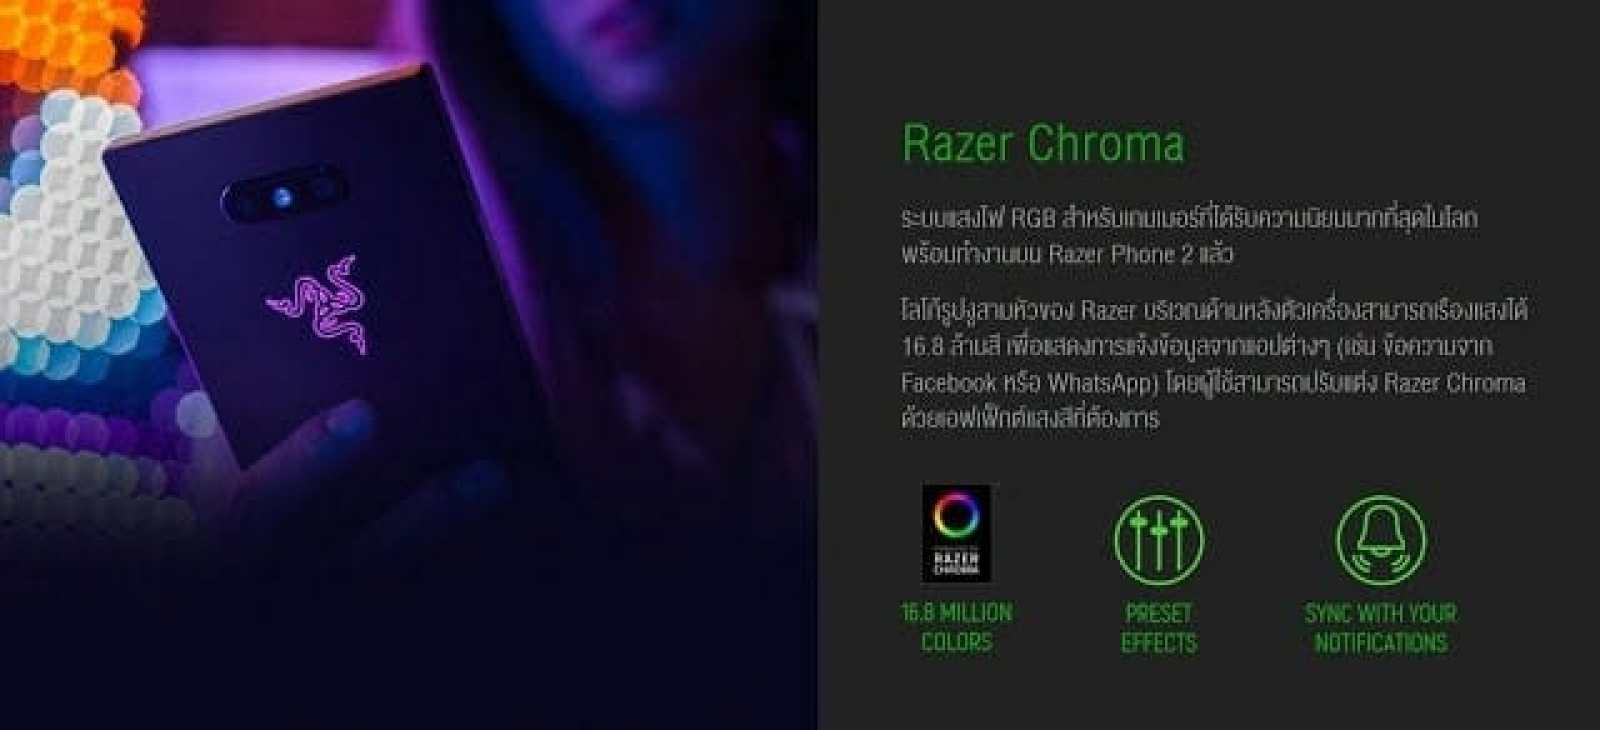 - Screenshot 10 9 - AIS วางจำหน่าย Razer Phone 2 ในไทย ราคา 27,990 บาท